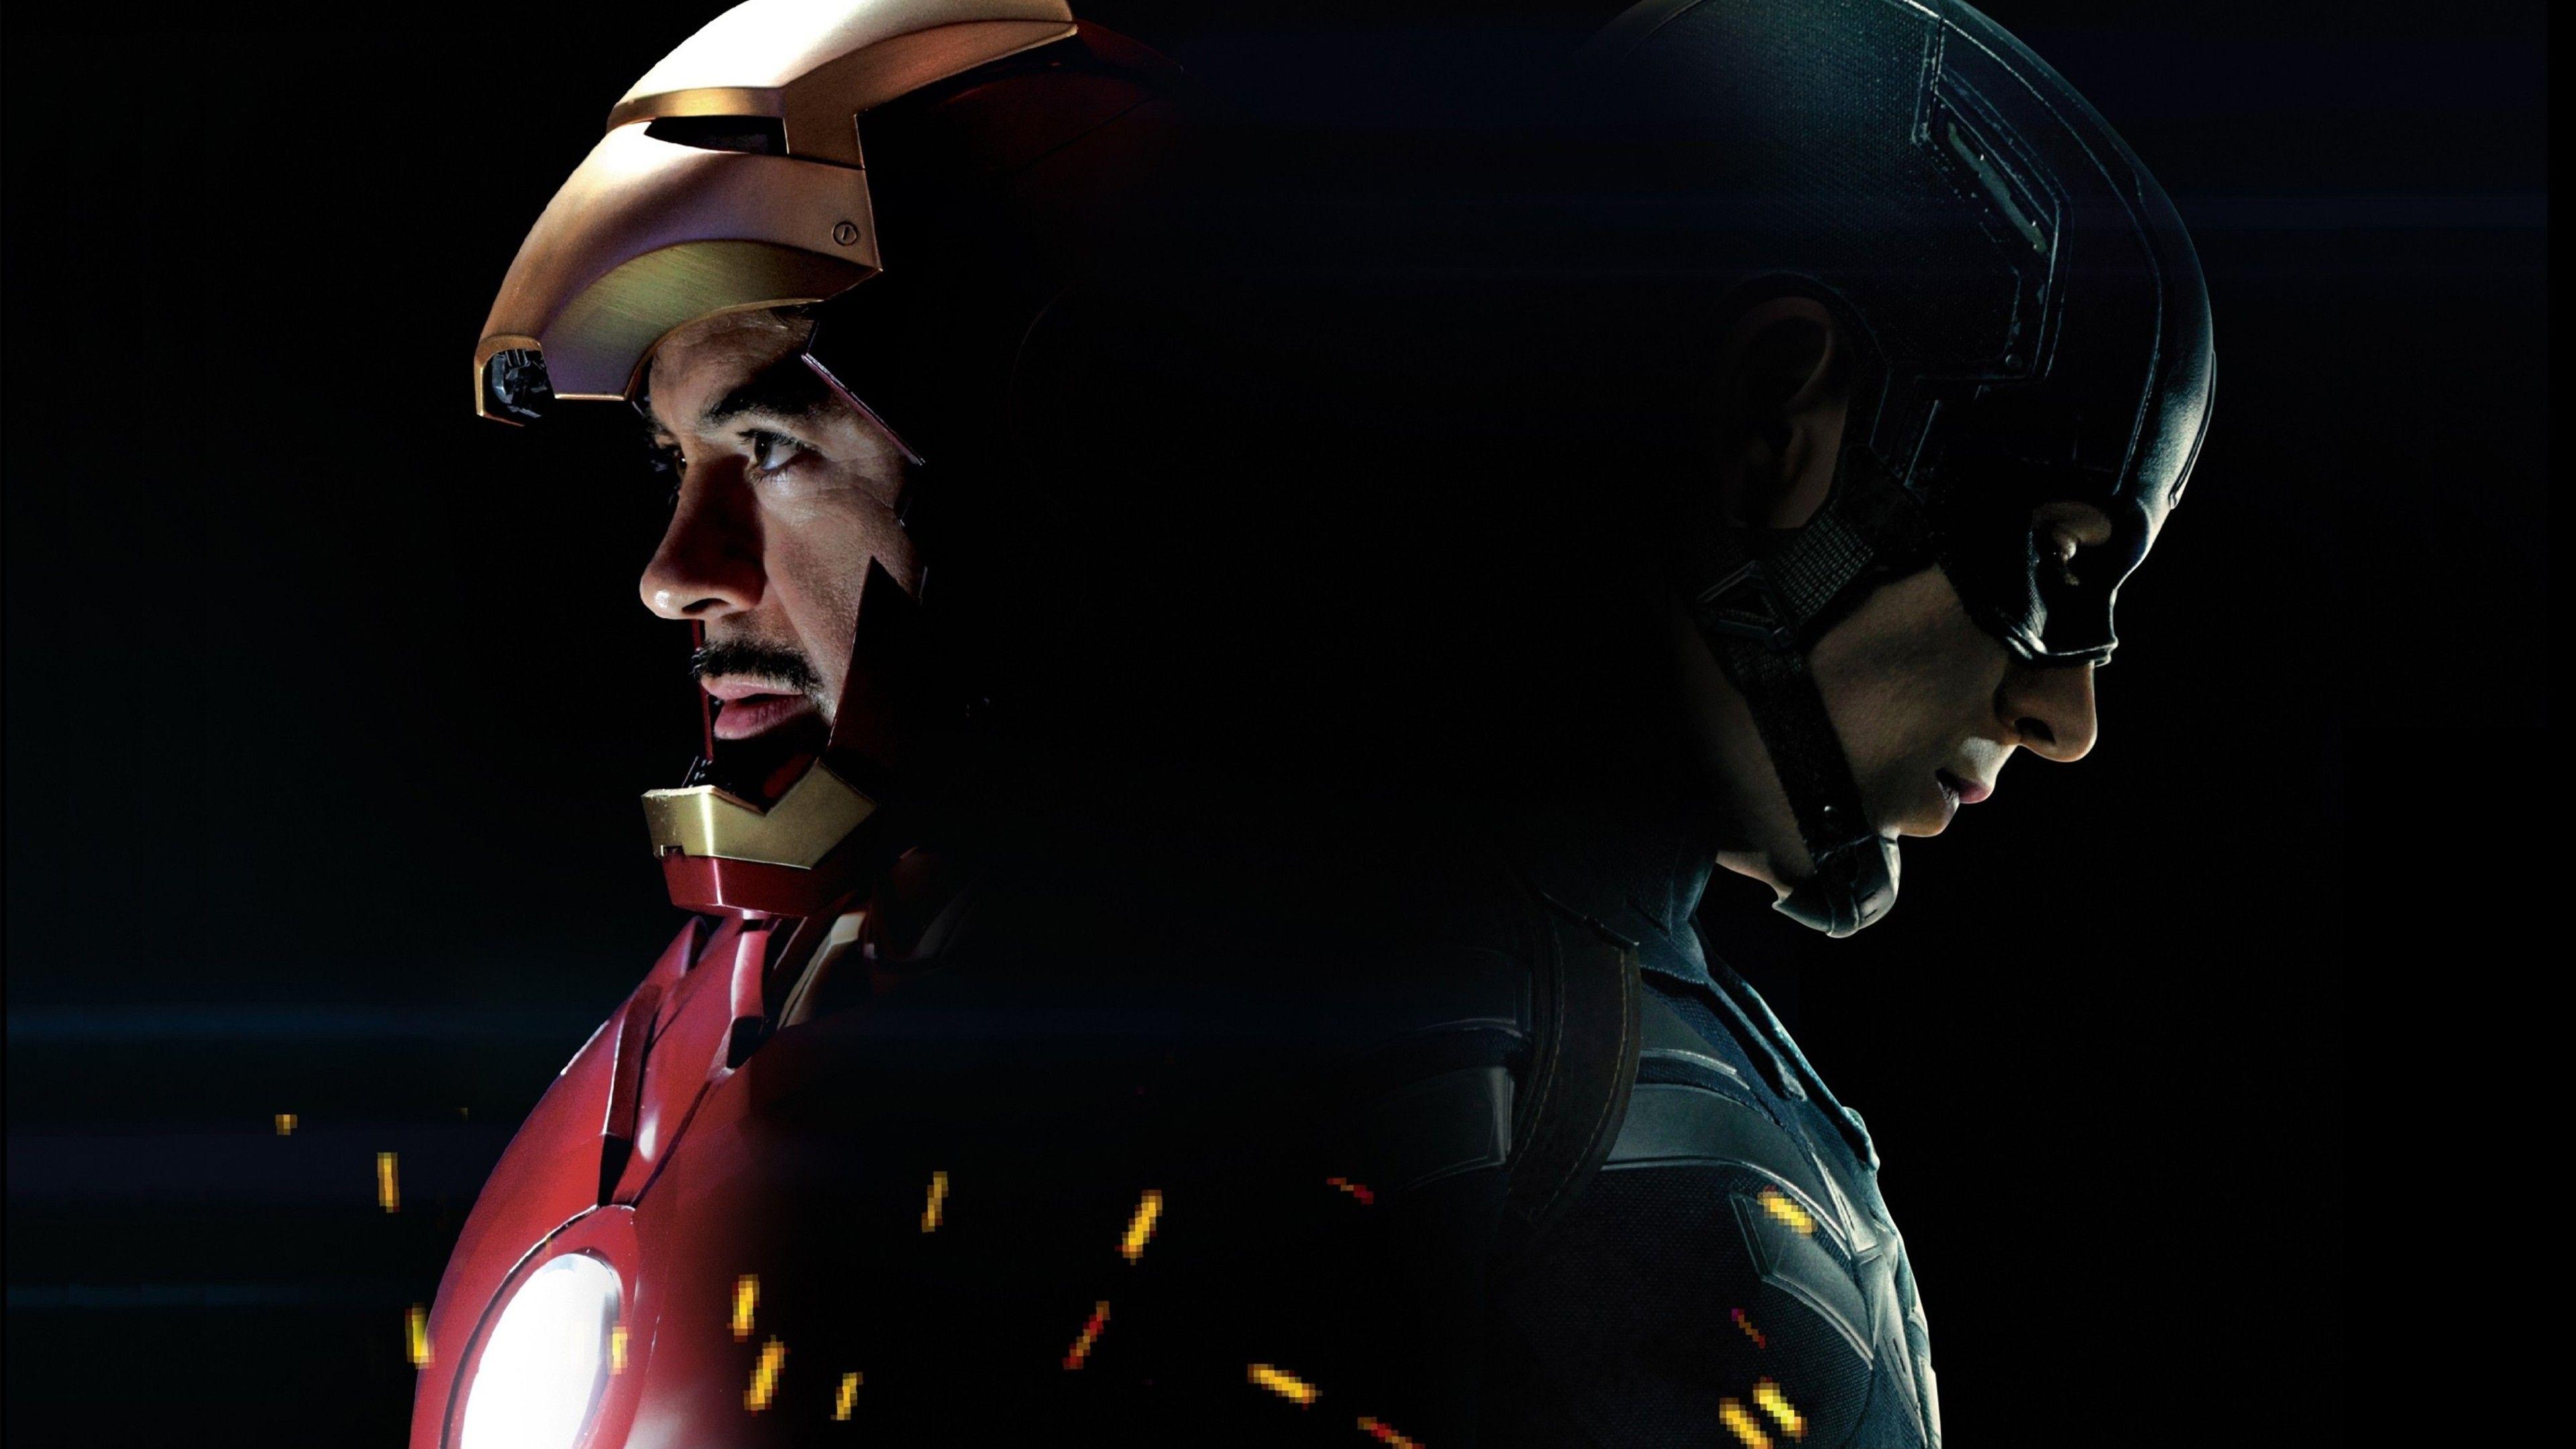 18 Captain America And Iron Man Wallpapers On Wallpapersafari